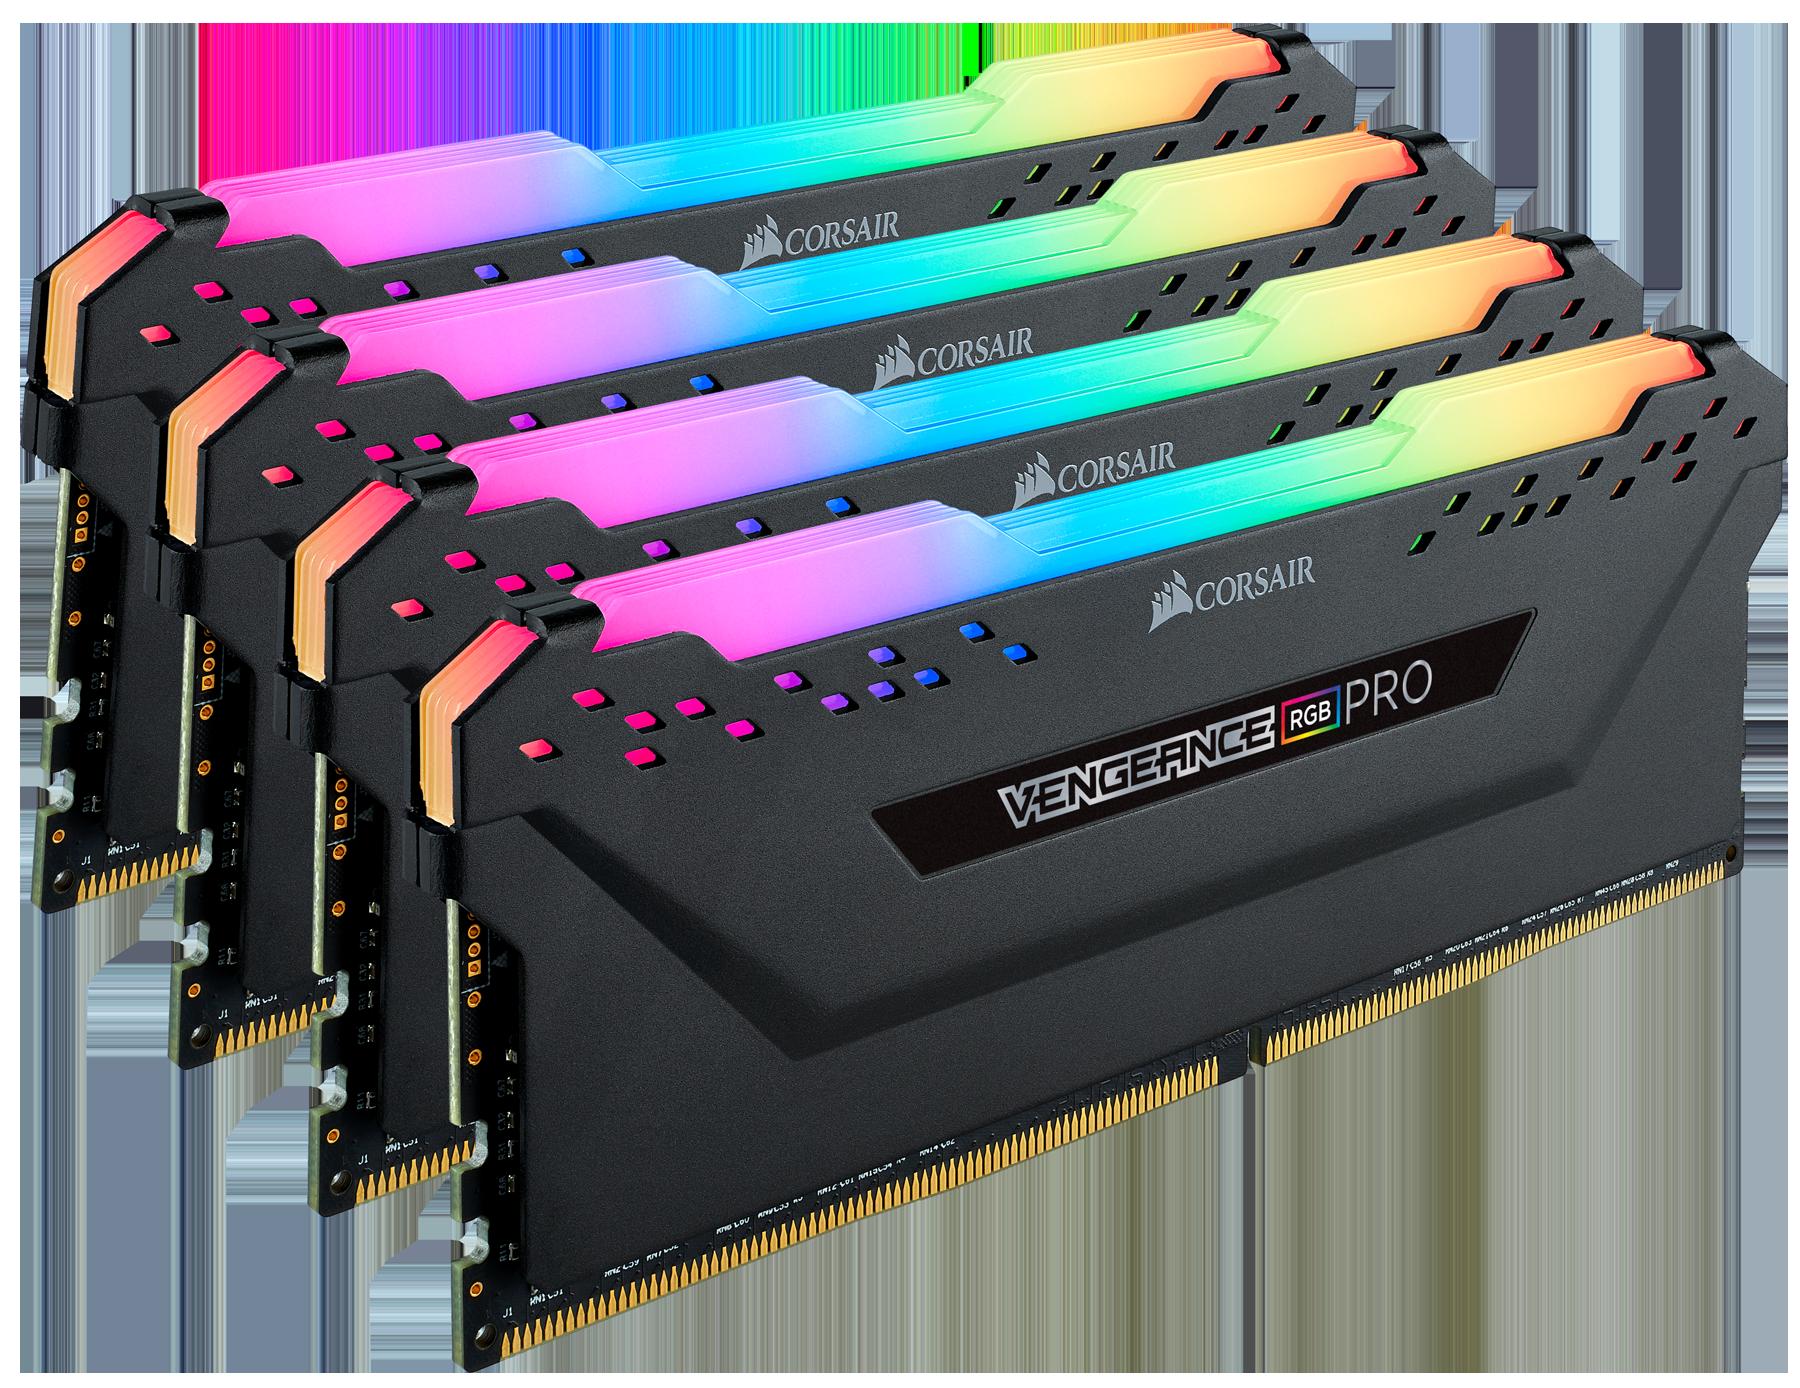 Corsair Announces Vengeance RGB Pro Memory: Up to DDR-4000, 10 RGB LEDs